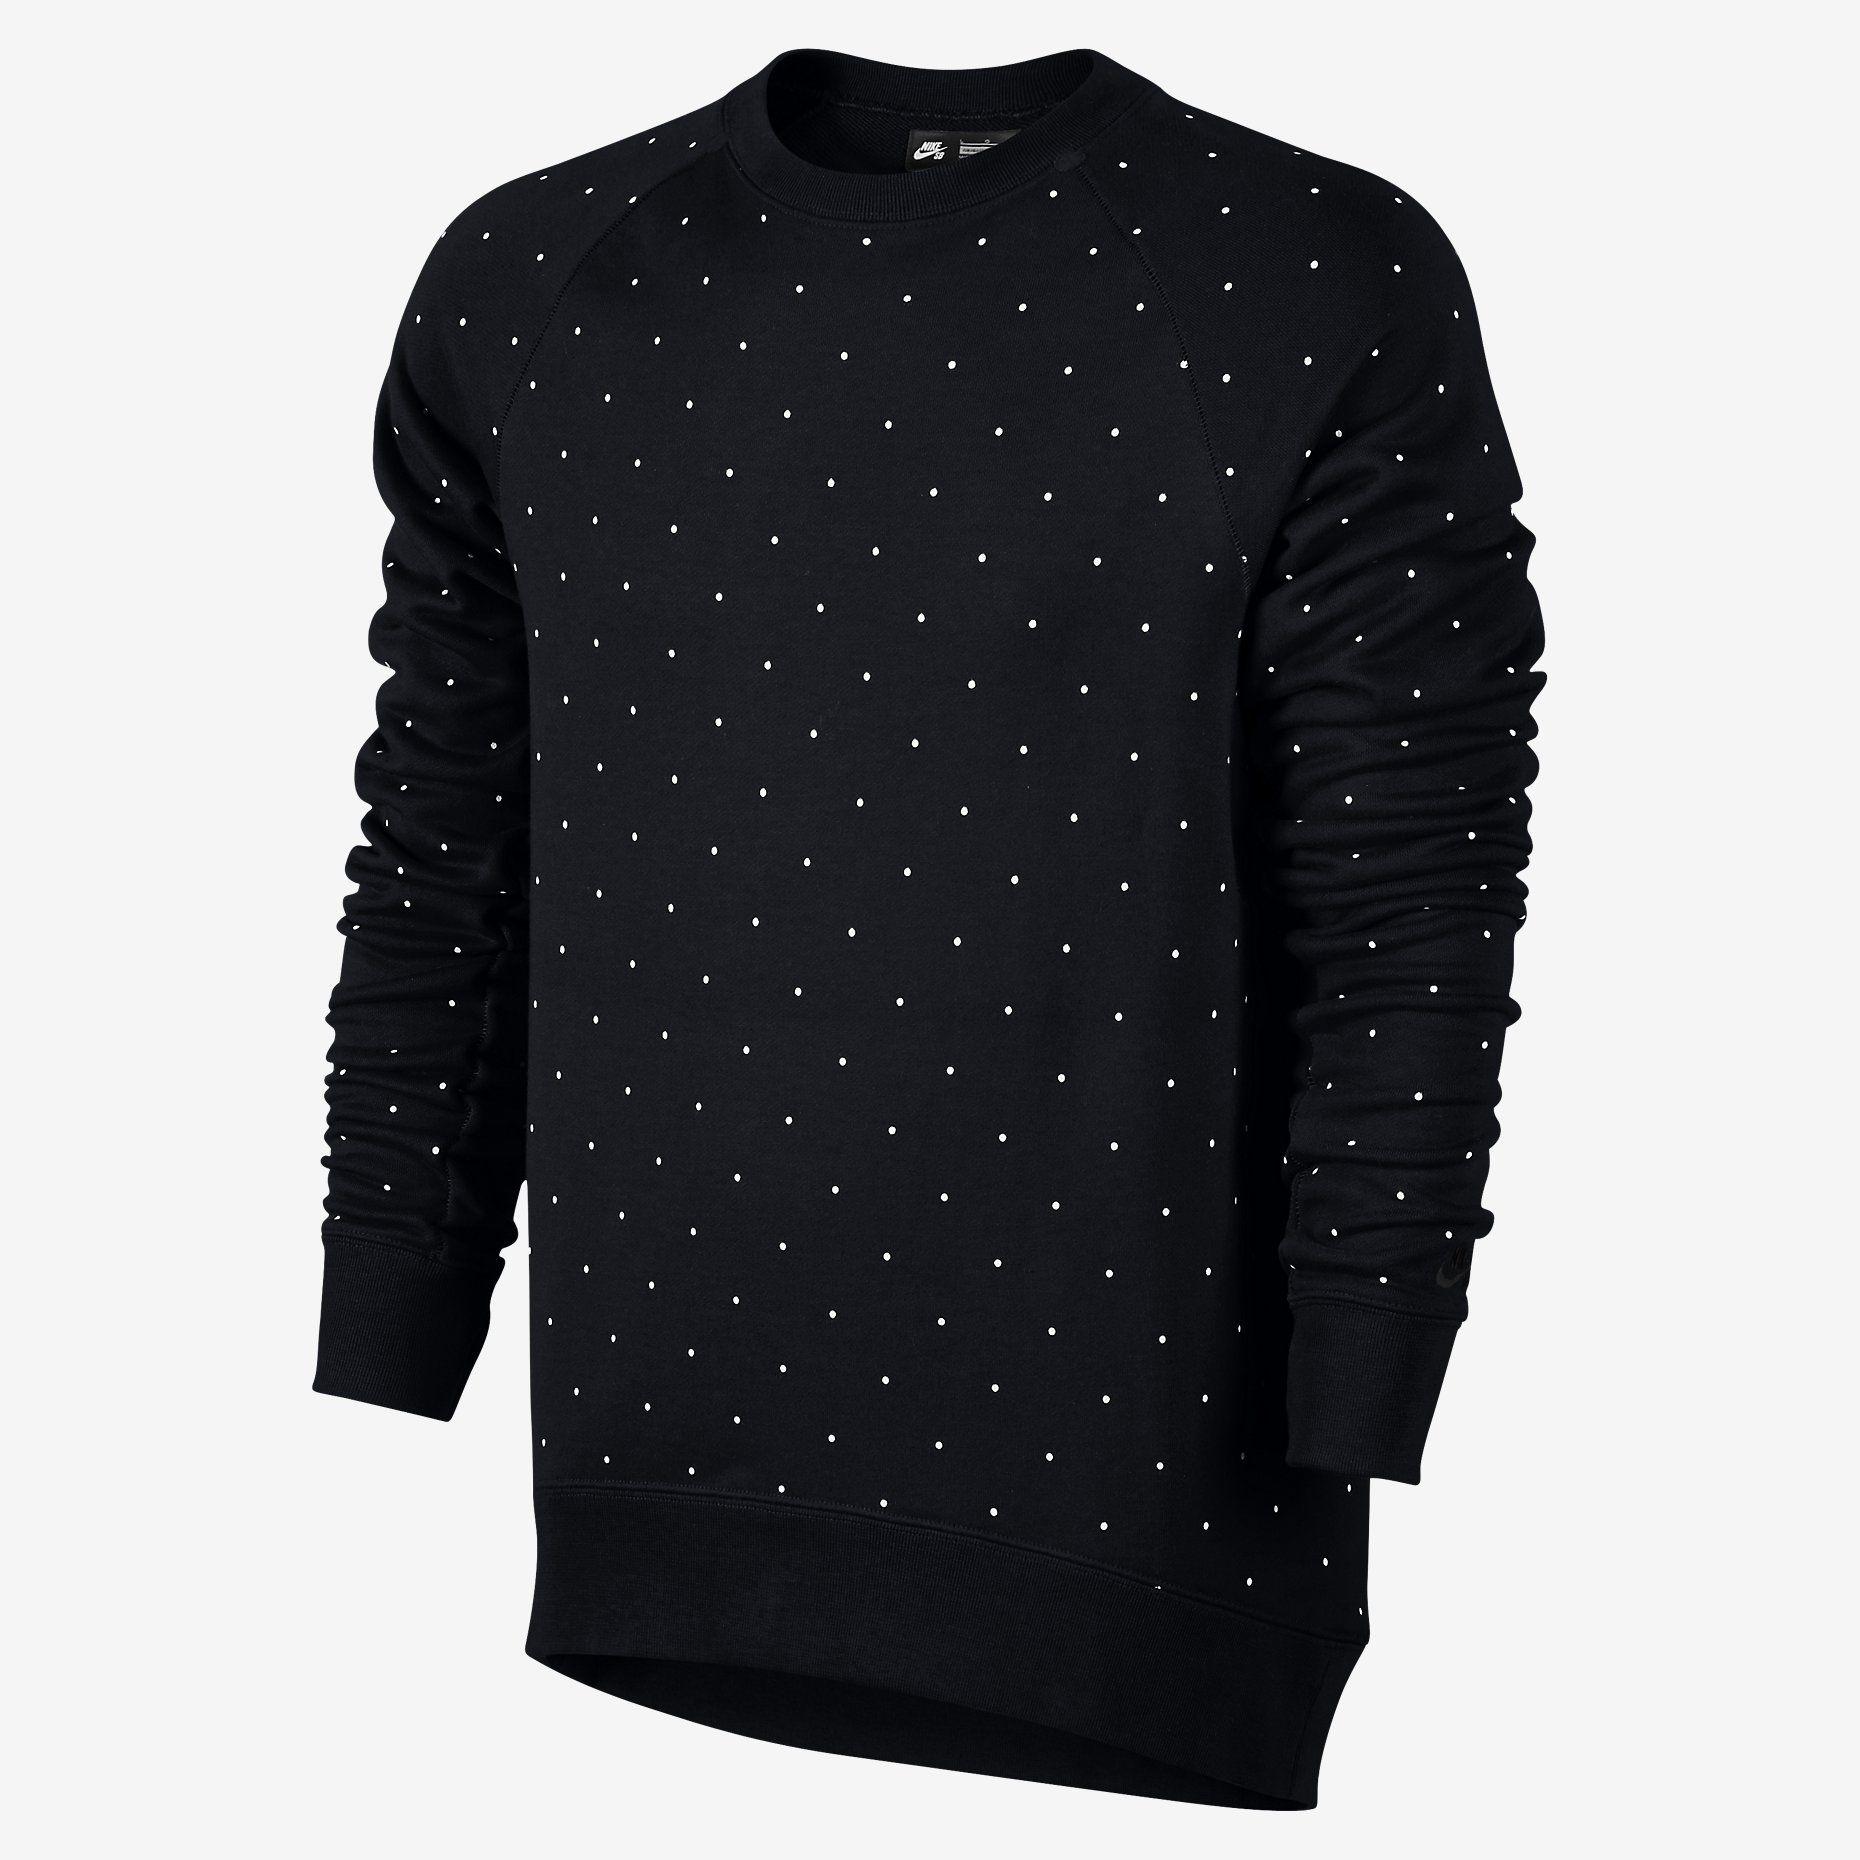 Nike Sb Everett Polka Dot Crew Men S Sweatshirt Nike Store Uk Mens Sweatshirts Nike Store Clothes [ 1860 x 1860 Pixel ]